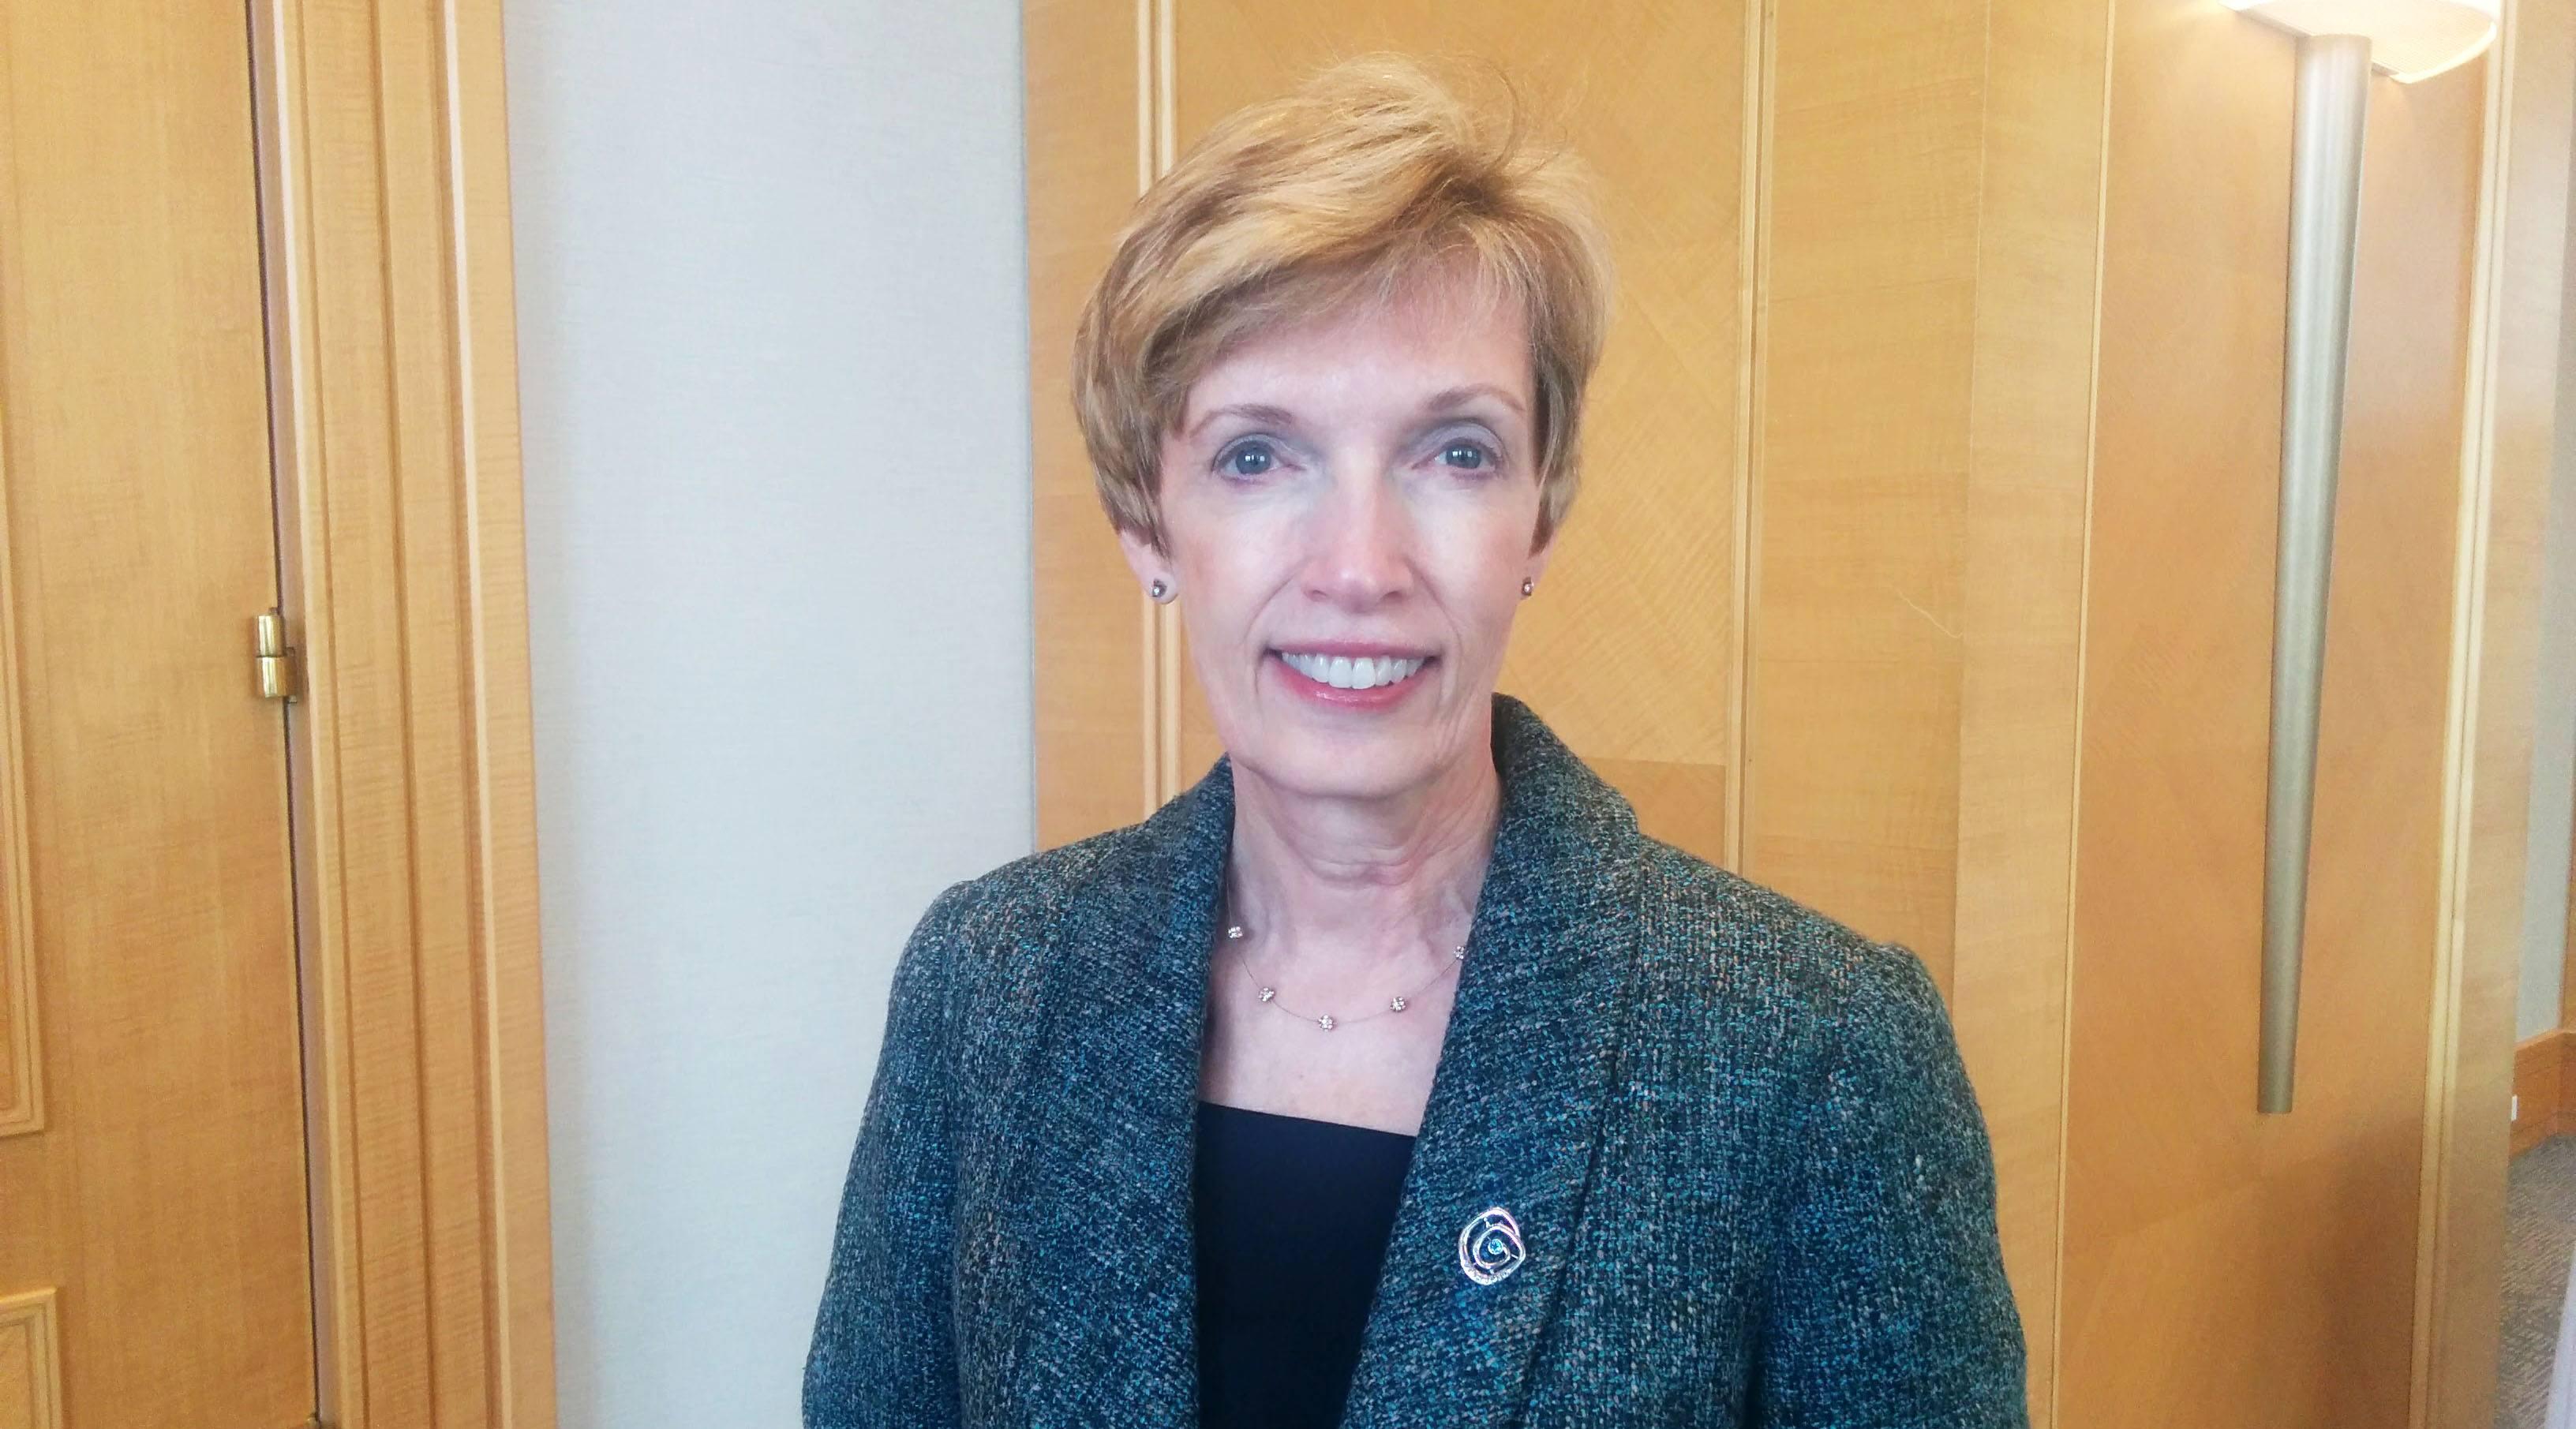 Awardwinner Kathy Kinloch, President of BCIT (Jenni Sheppard/Daily Hive)